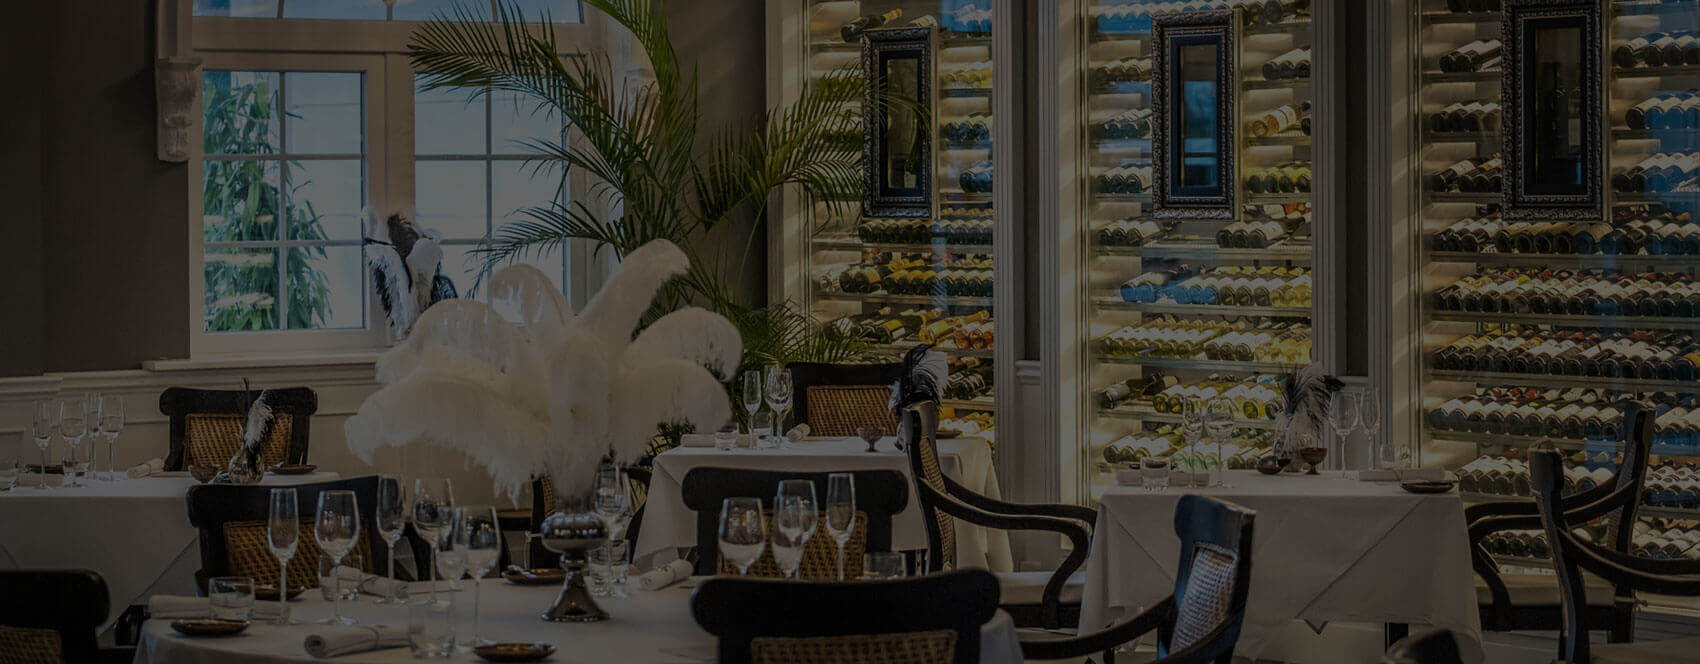 aperitif-reservation-image